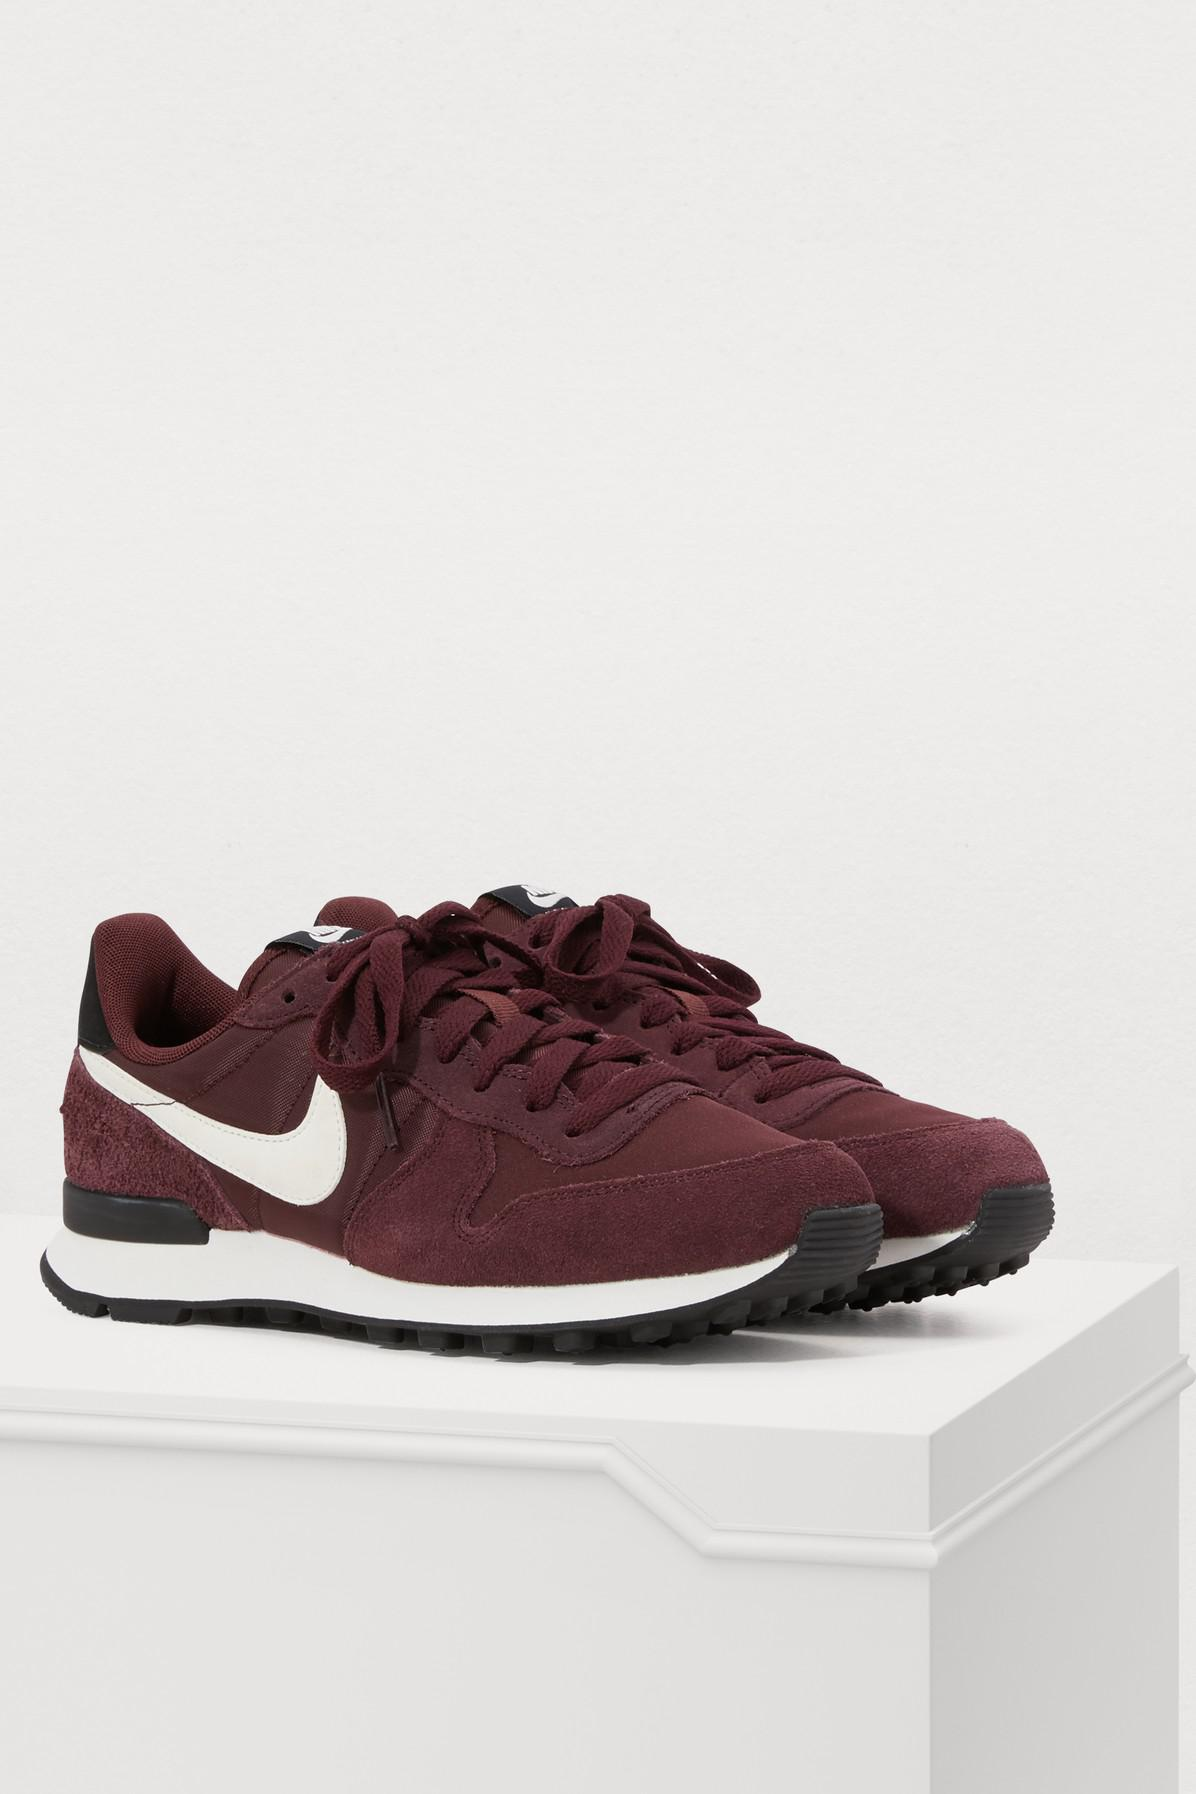 Nike Burgundy Internationalist Suede